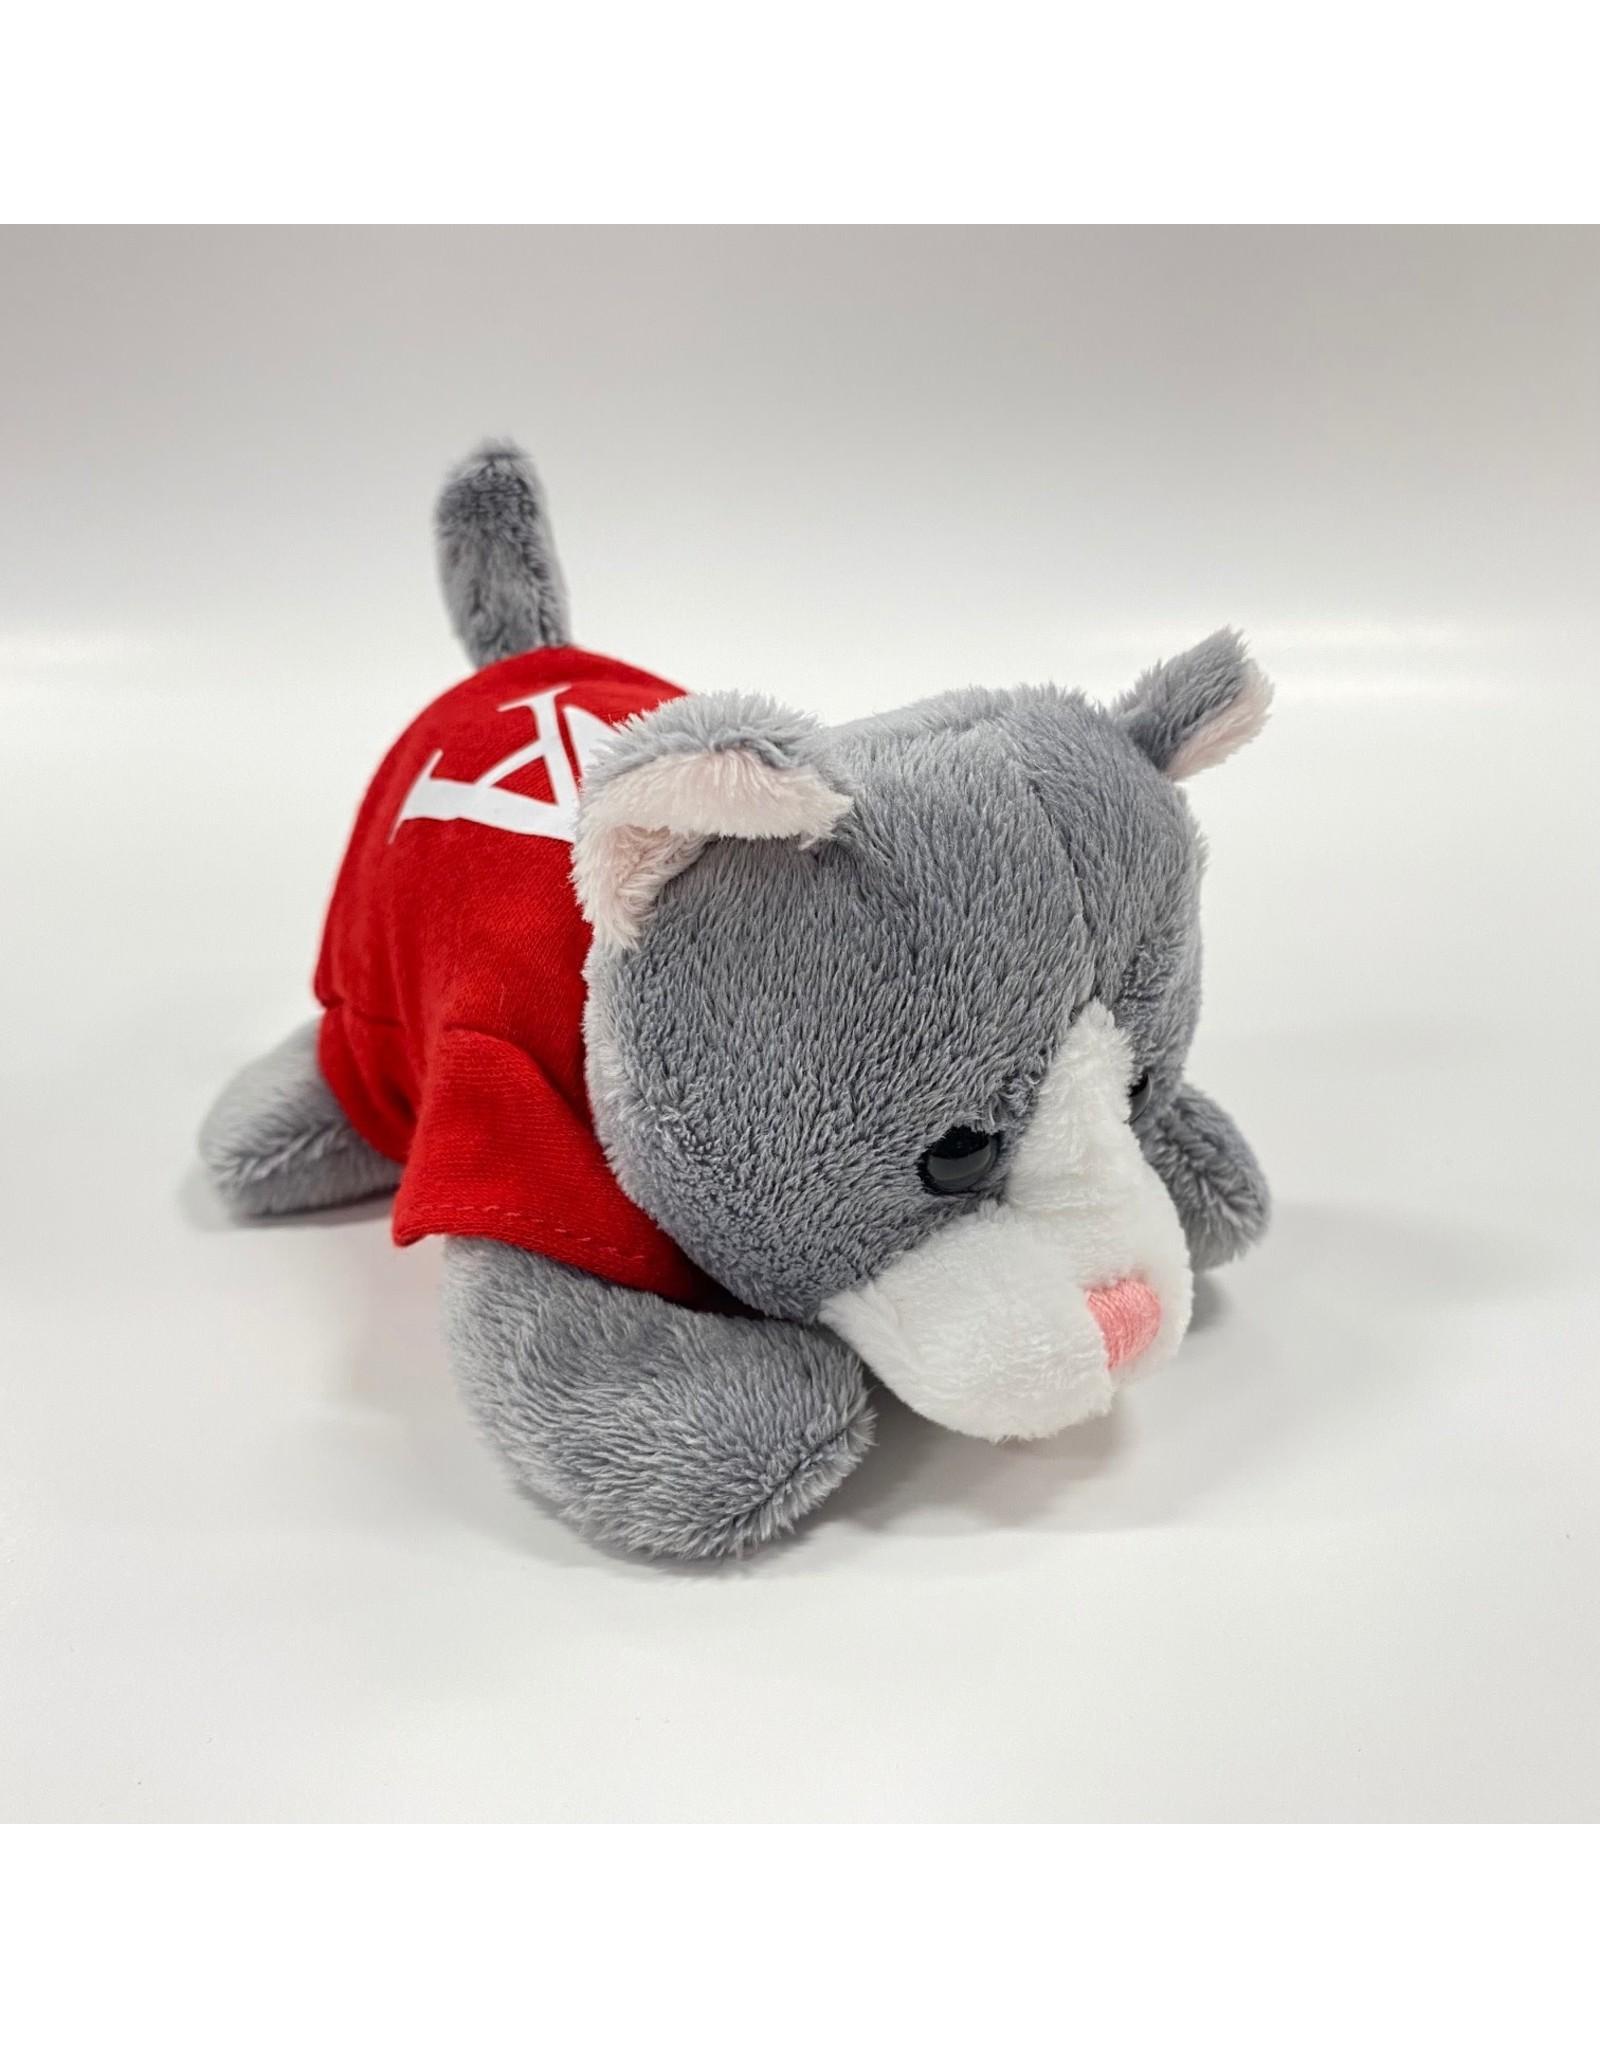 Mascot Factory Plush Chublet - Cat